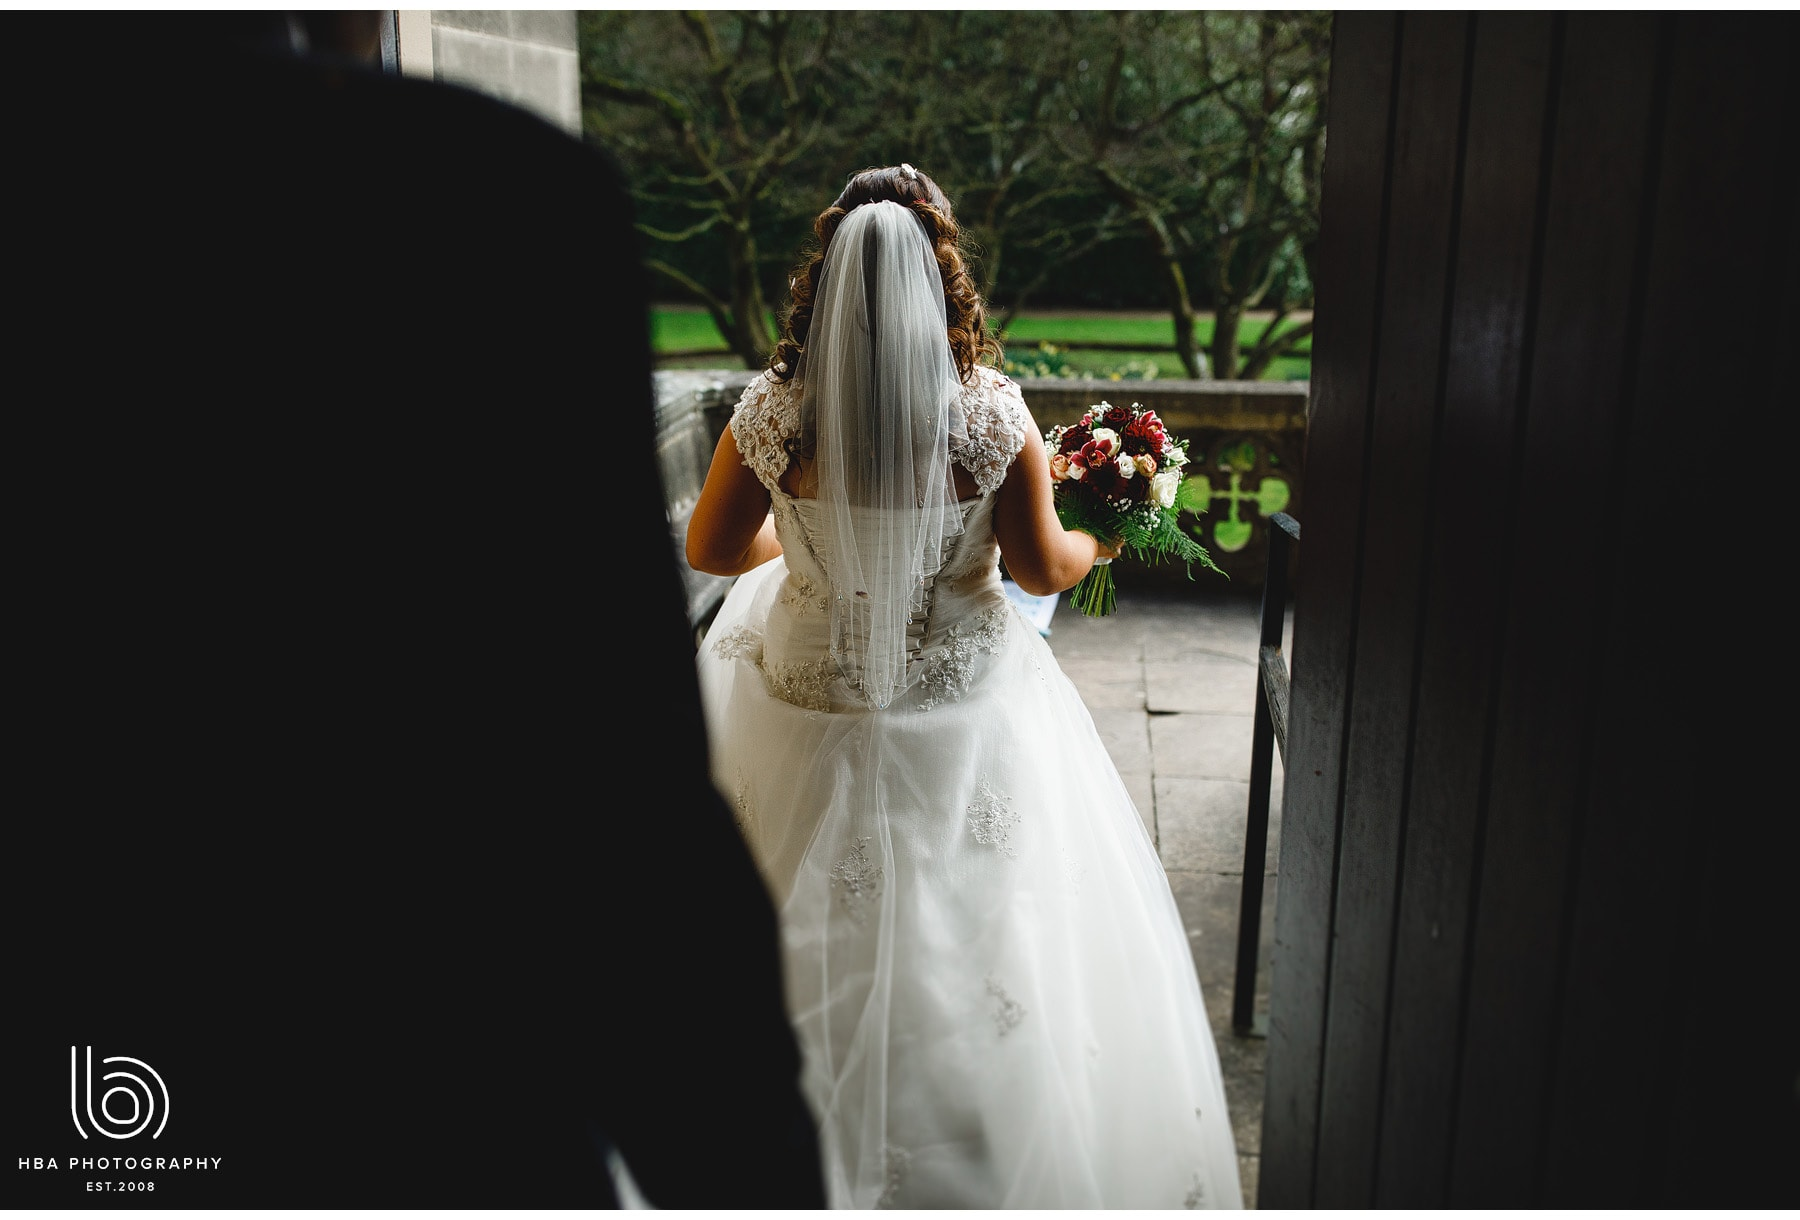 the bride walking into the gardens